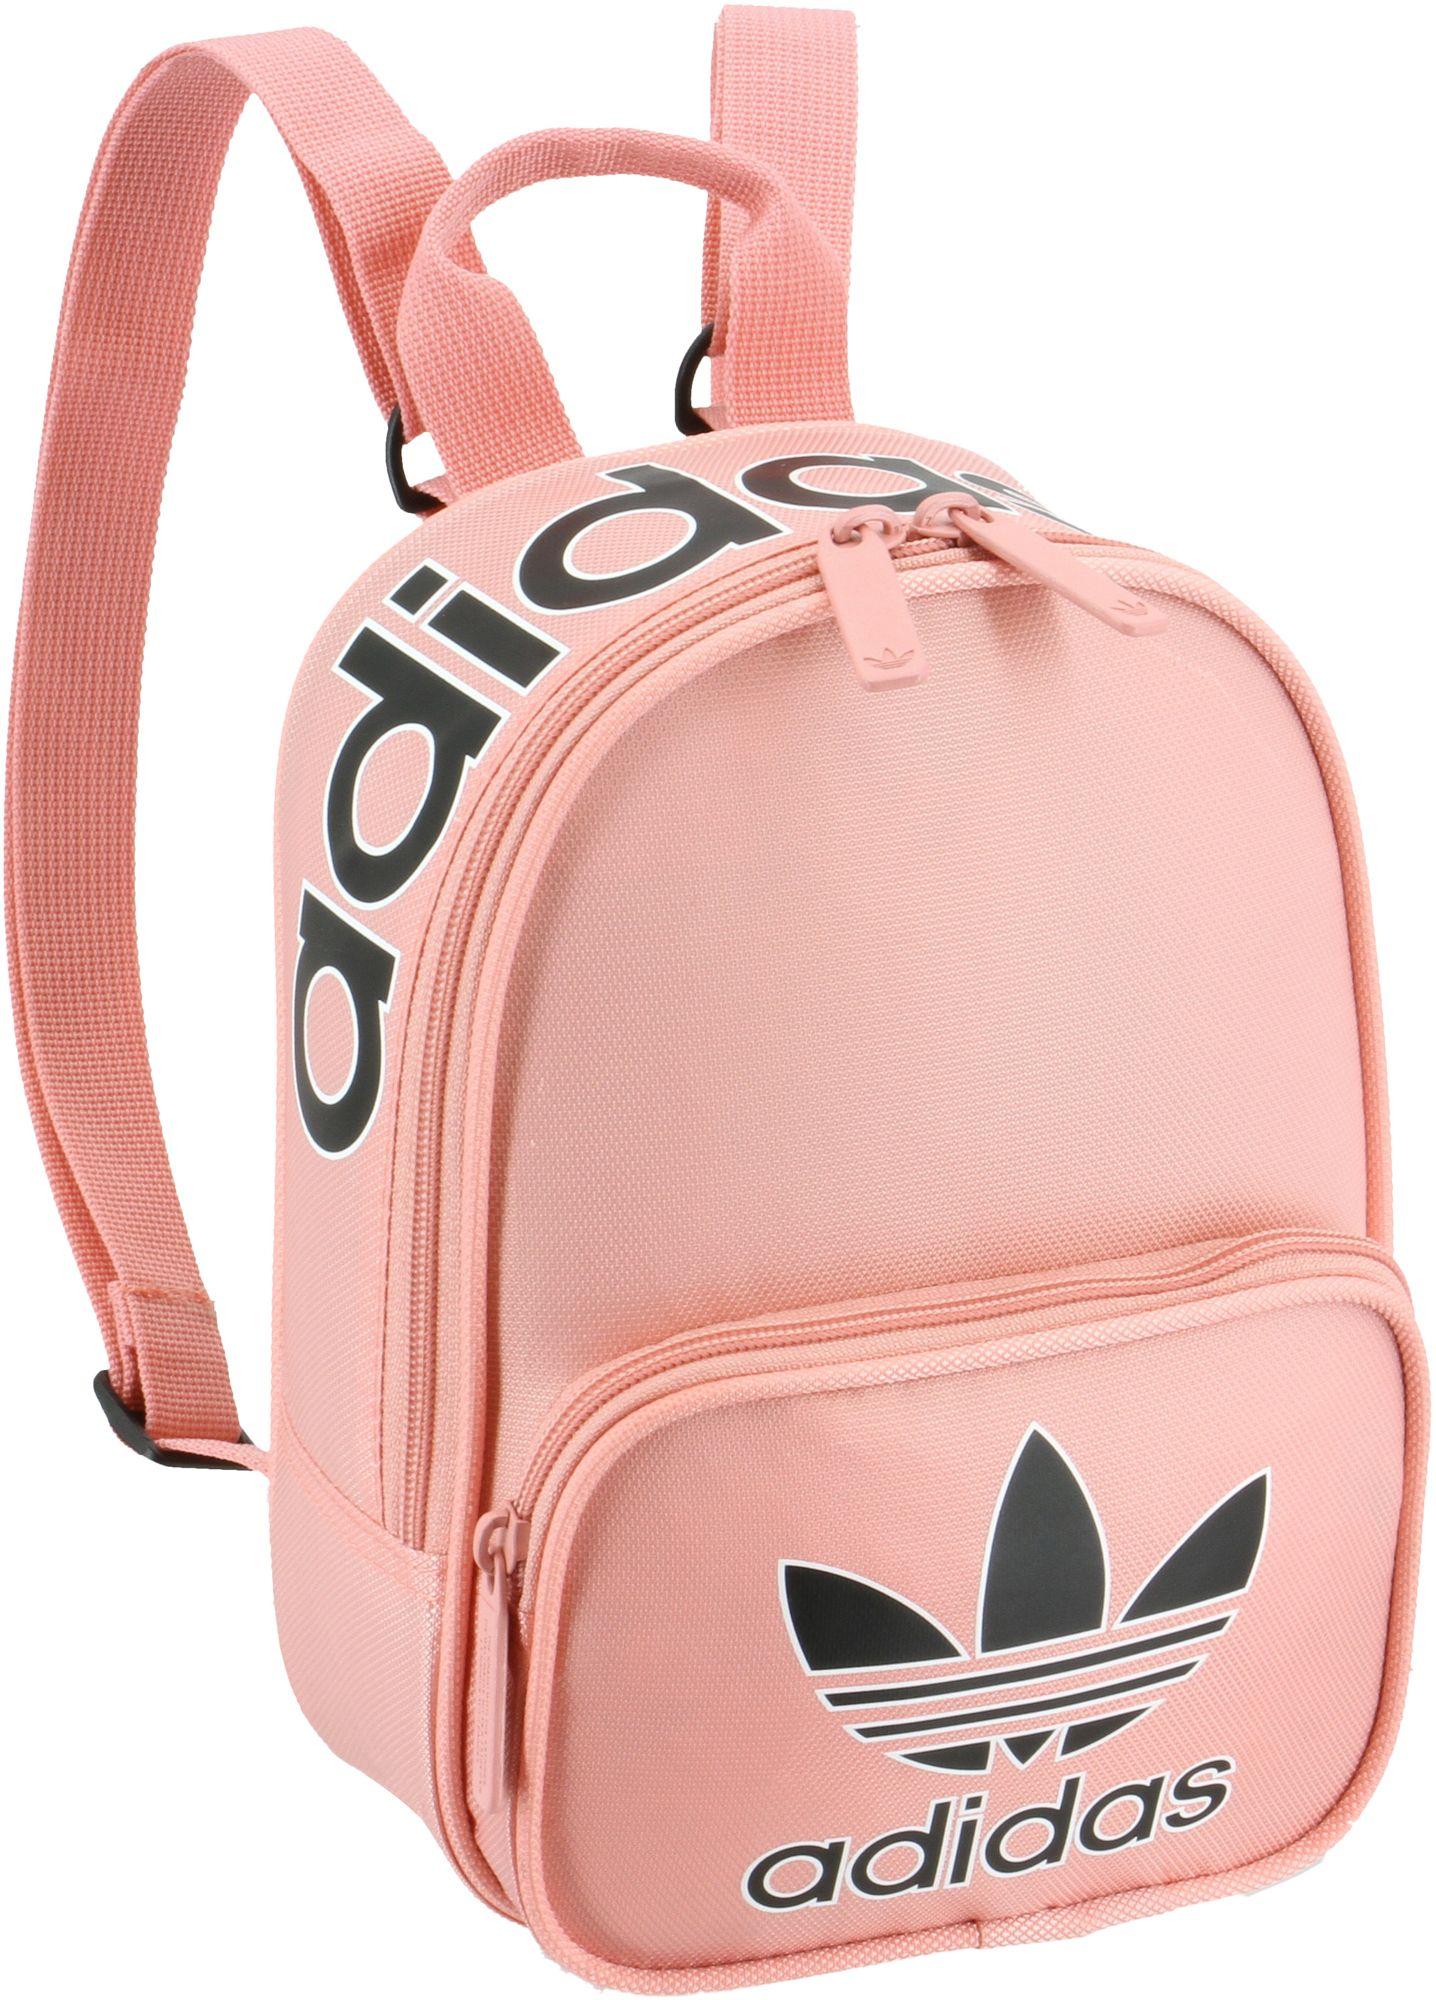 mini adidas backpack